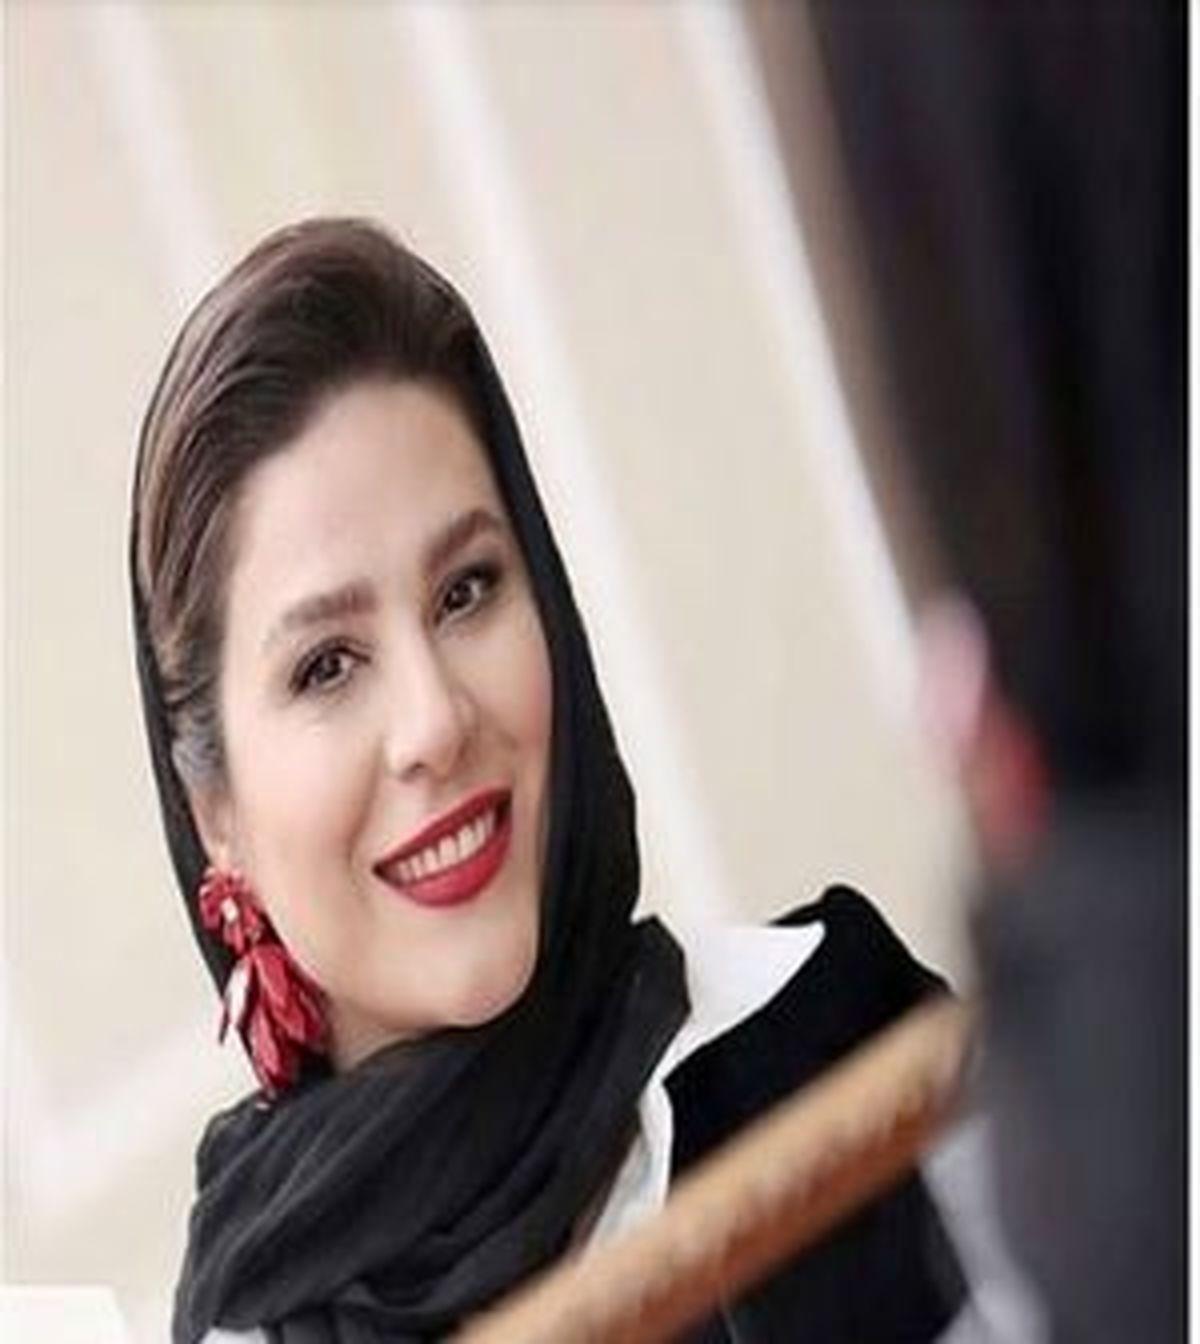 «سحر دولتشاهی» درآغوش کارگردان «خط فرضی»+ عکس